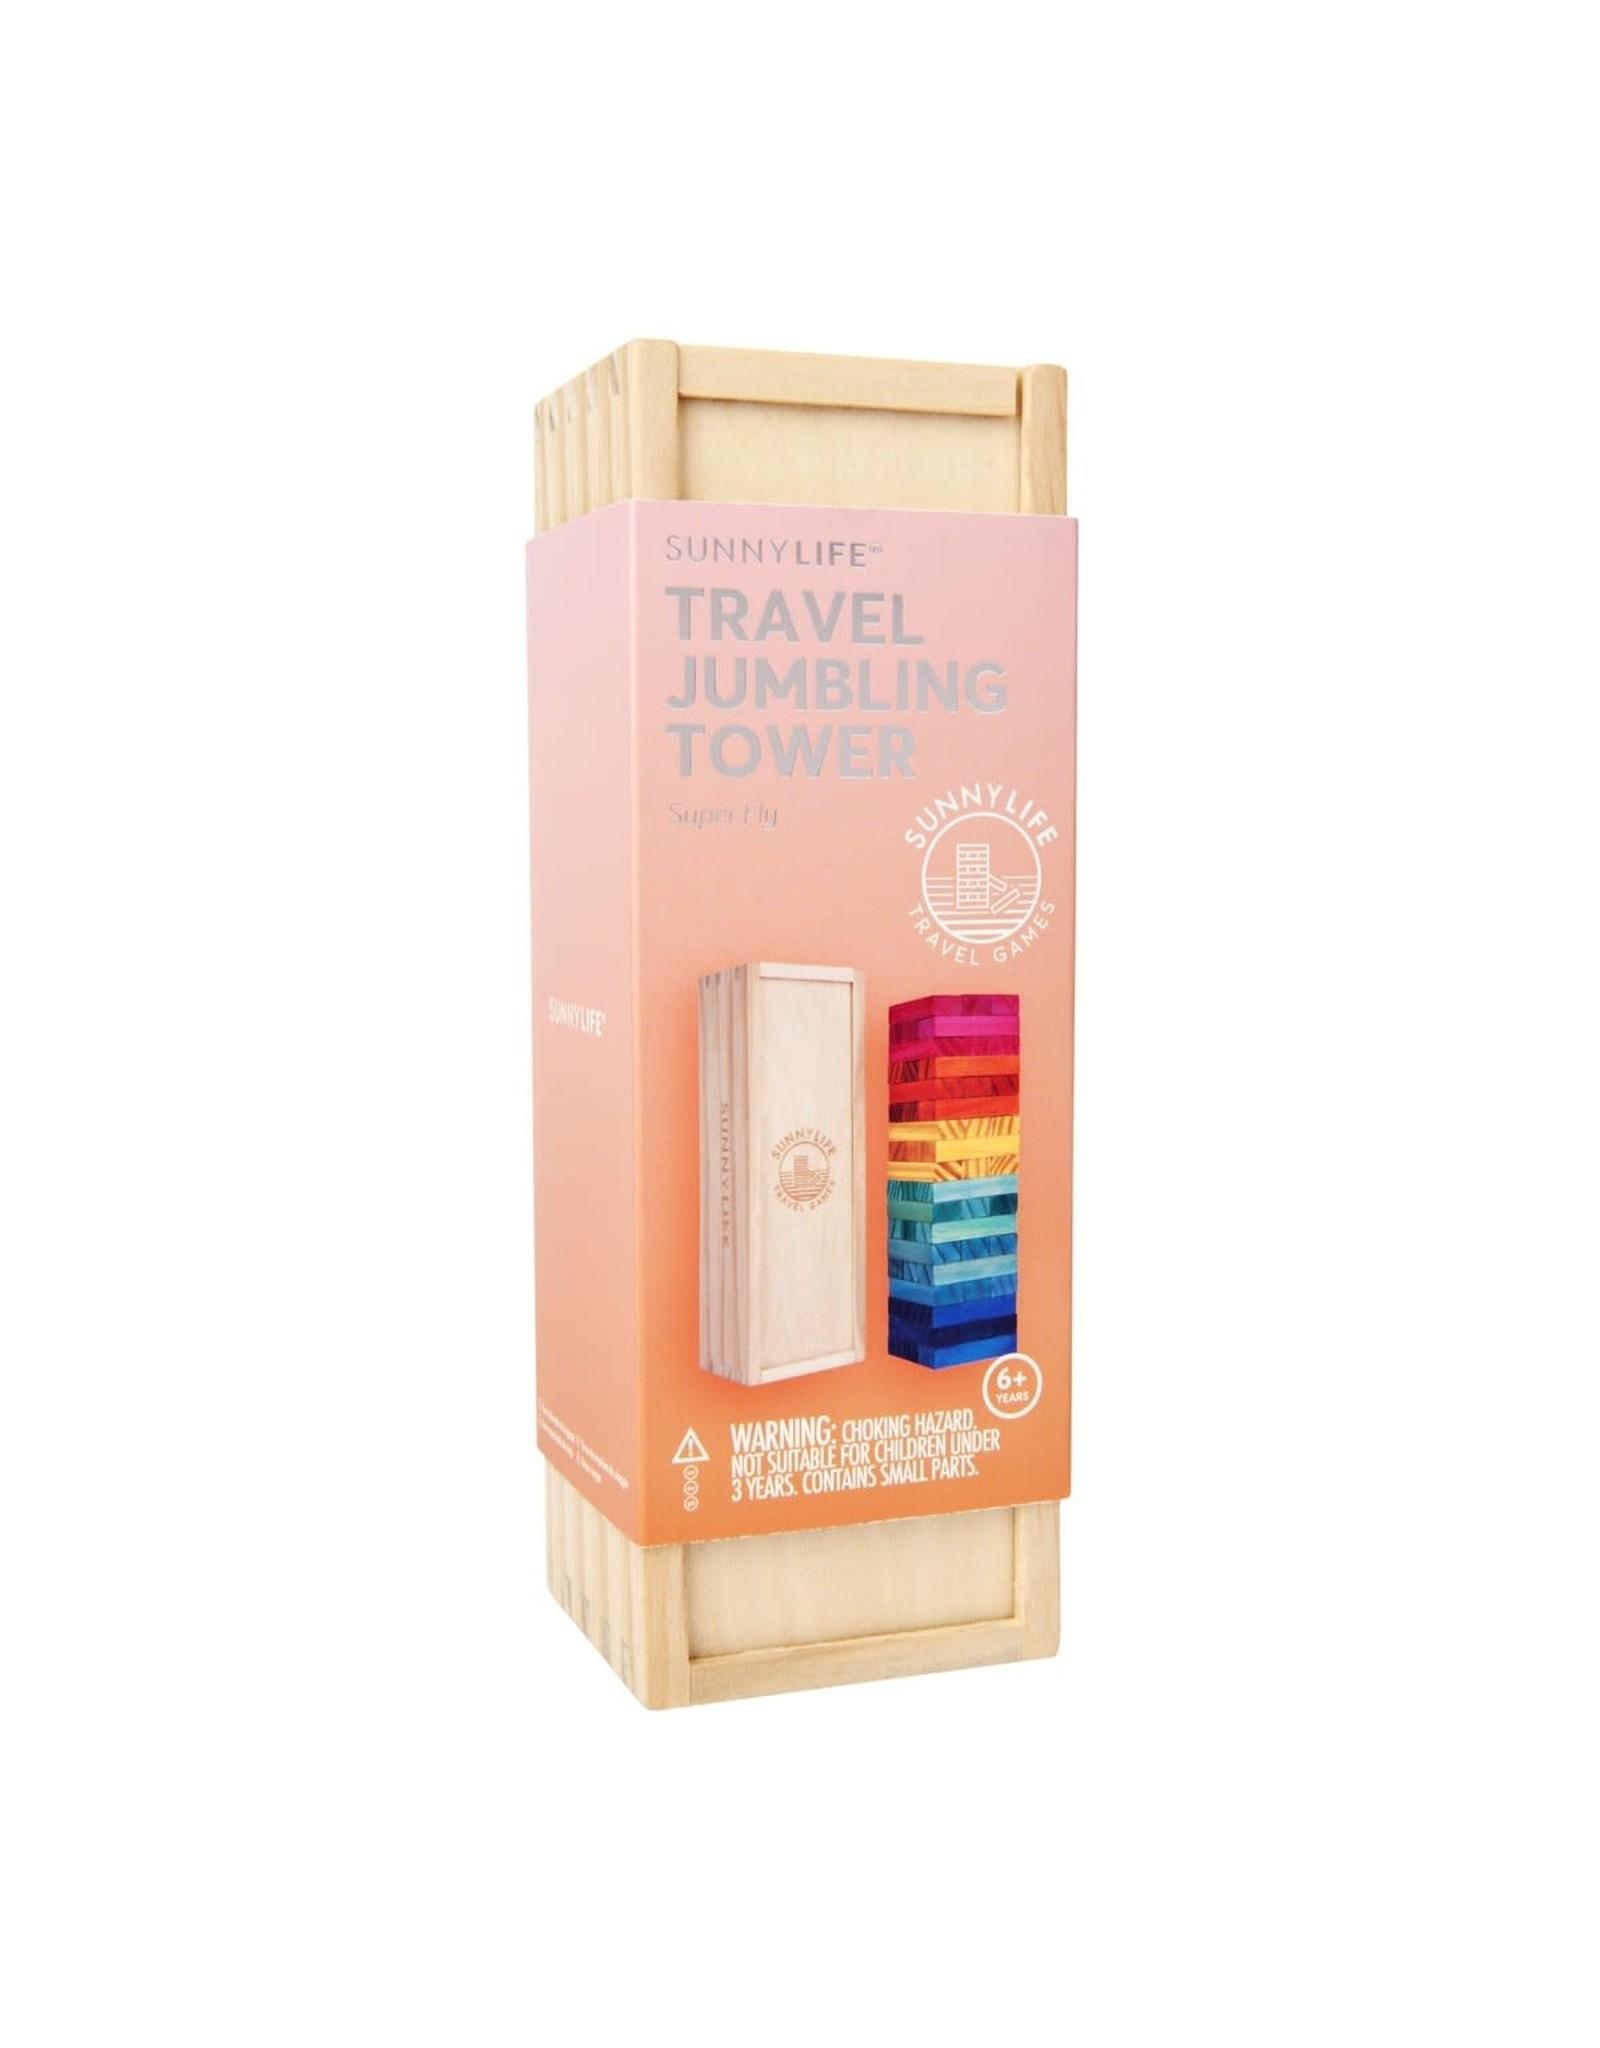 SunnyLife LLC Travel Jumbling Tower Super Fly